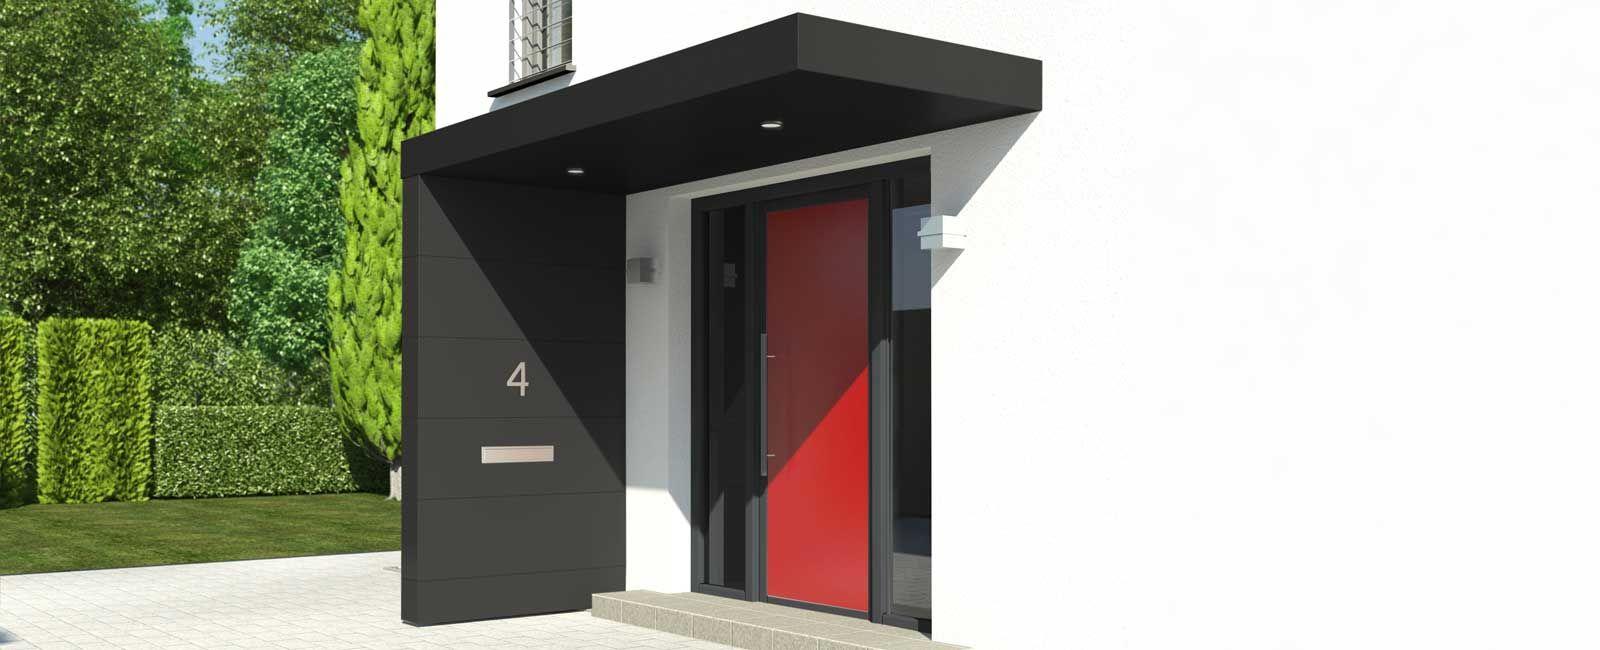 Eingangsuberdachung Beton Google Suche Sanierung Design Ideen Eingang Uberdachung